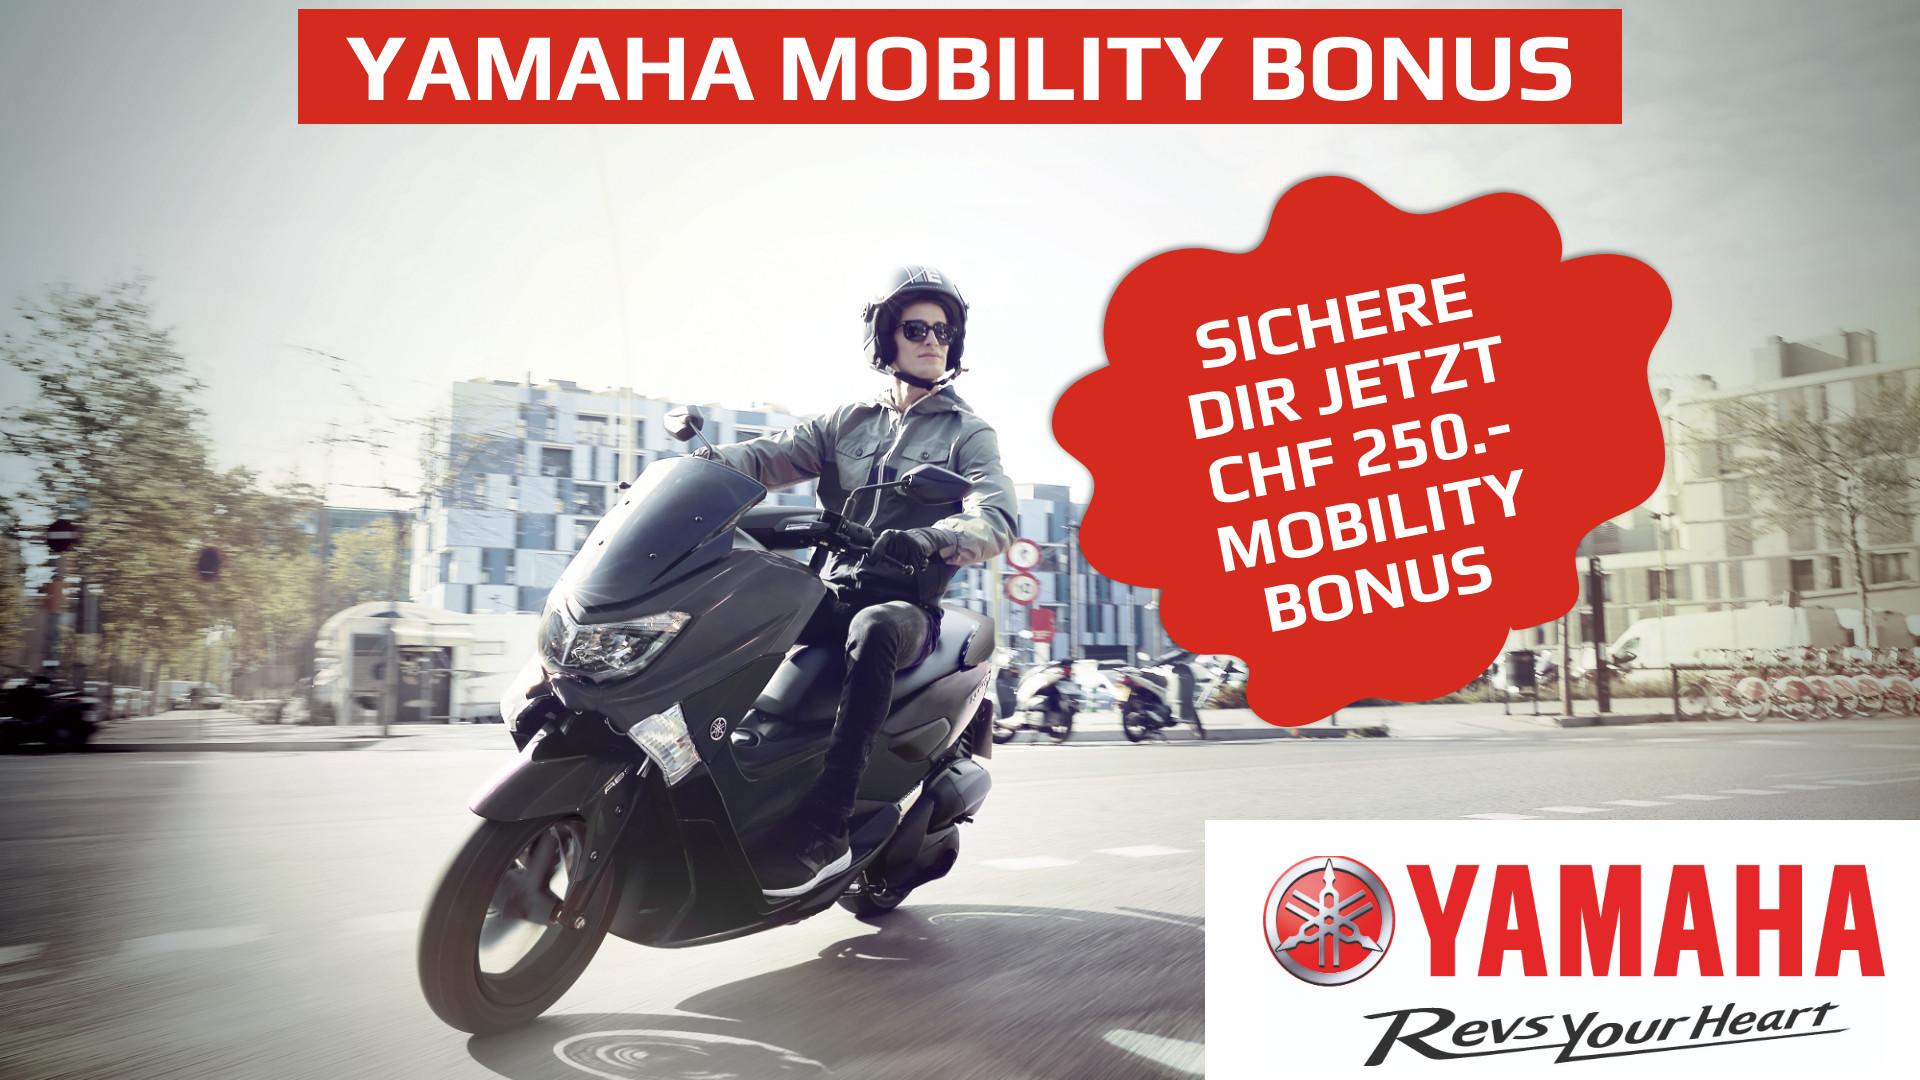 DE_Yamaha Mobility Bonus 2020_D'elight_1920x1080